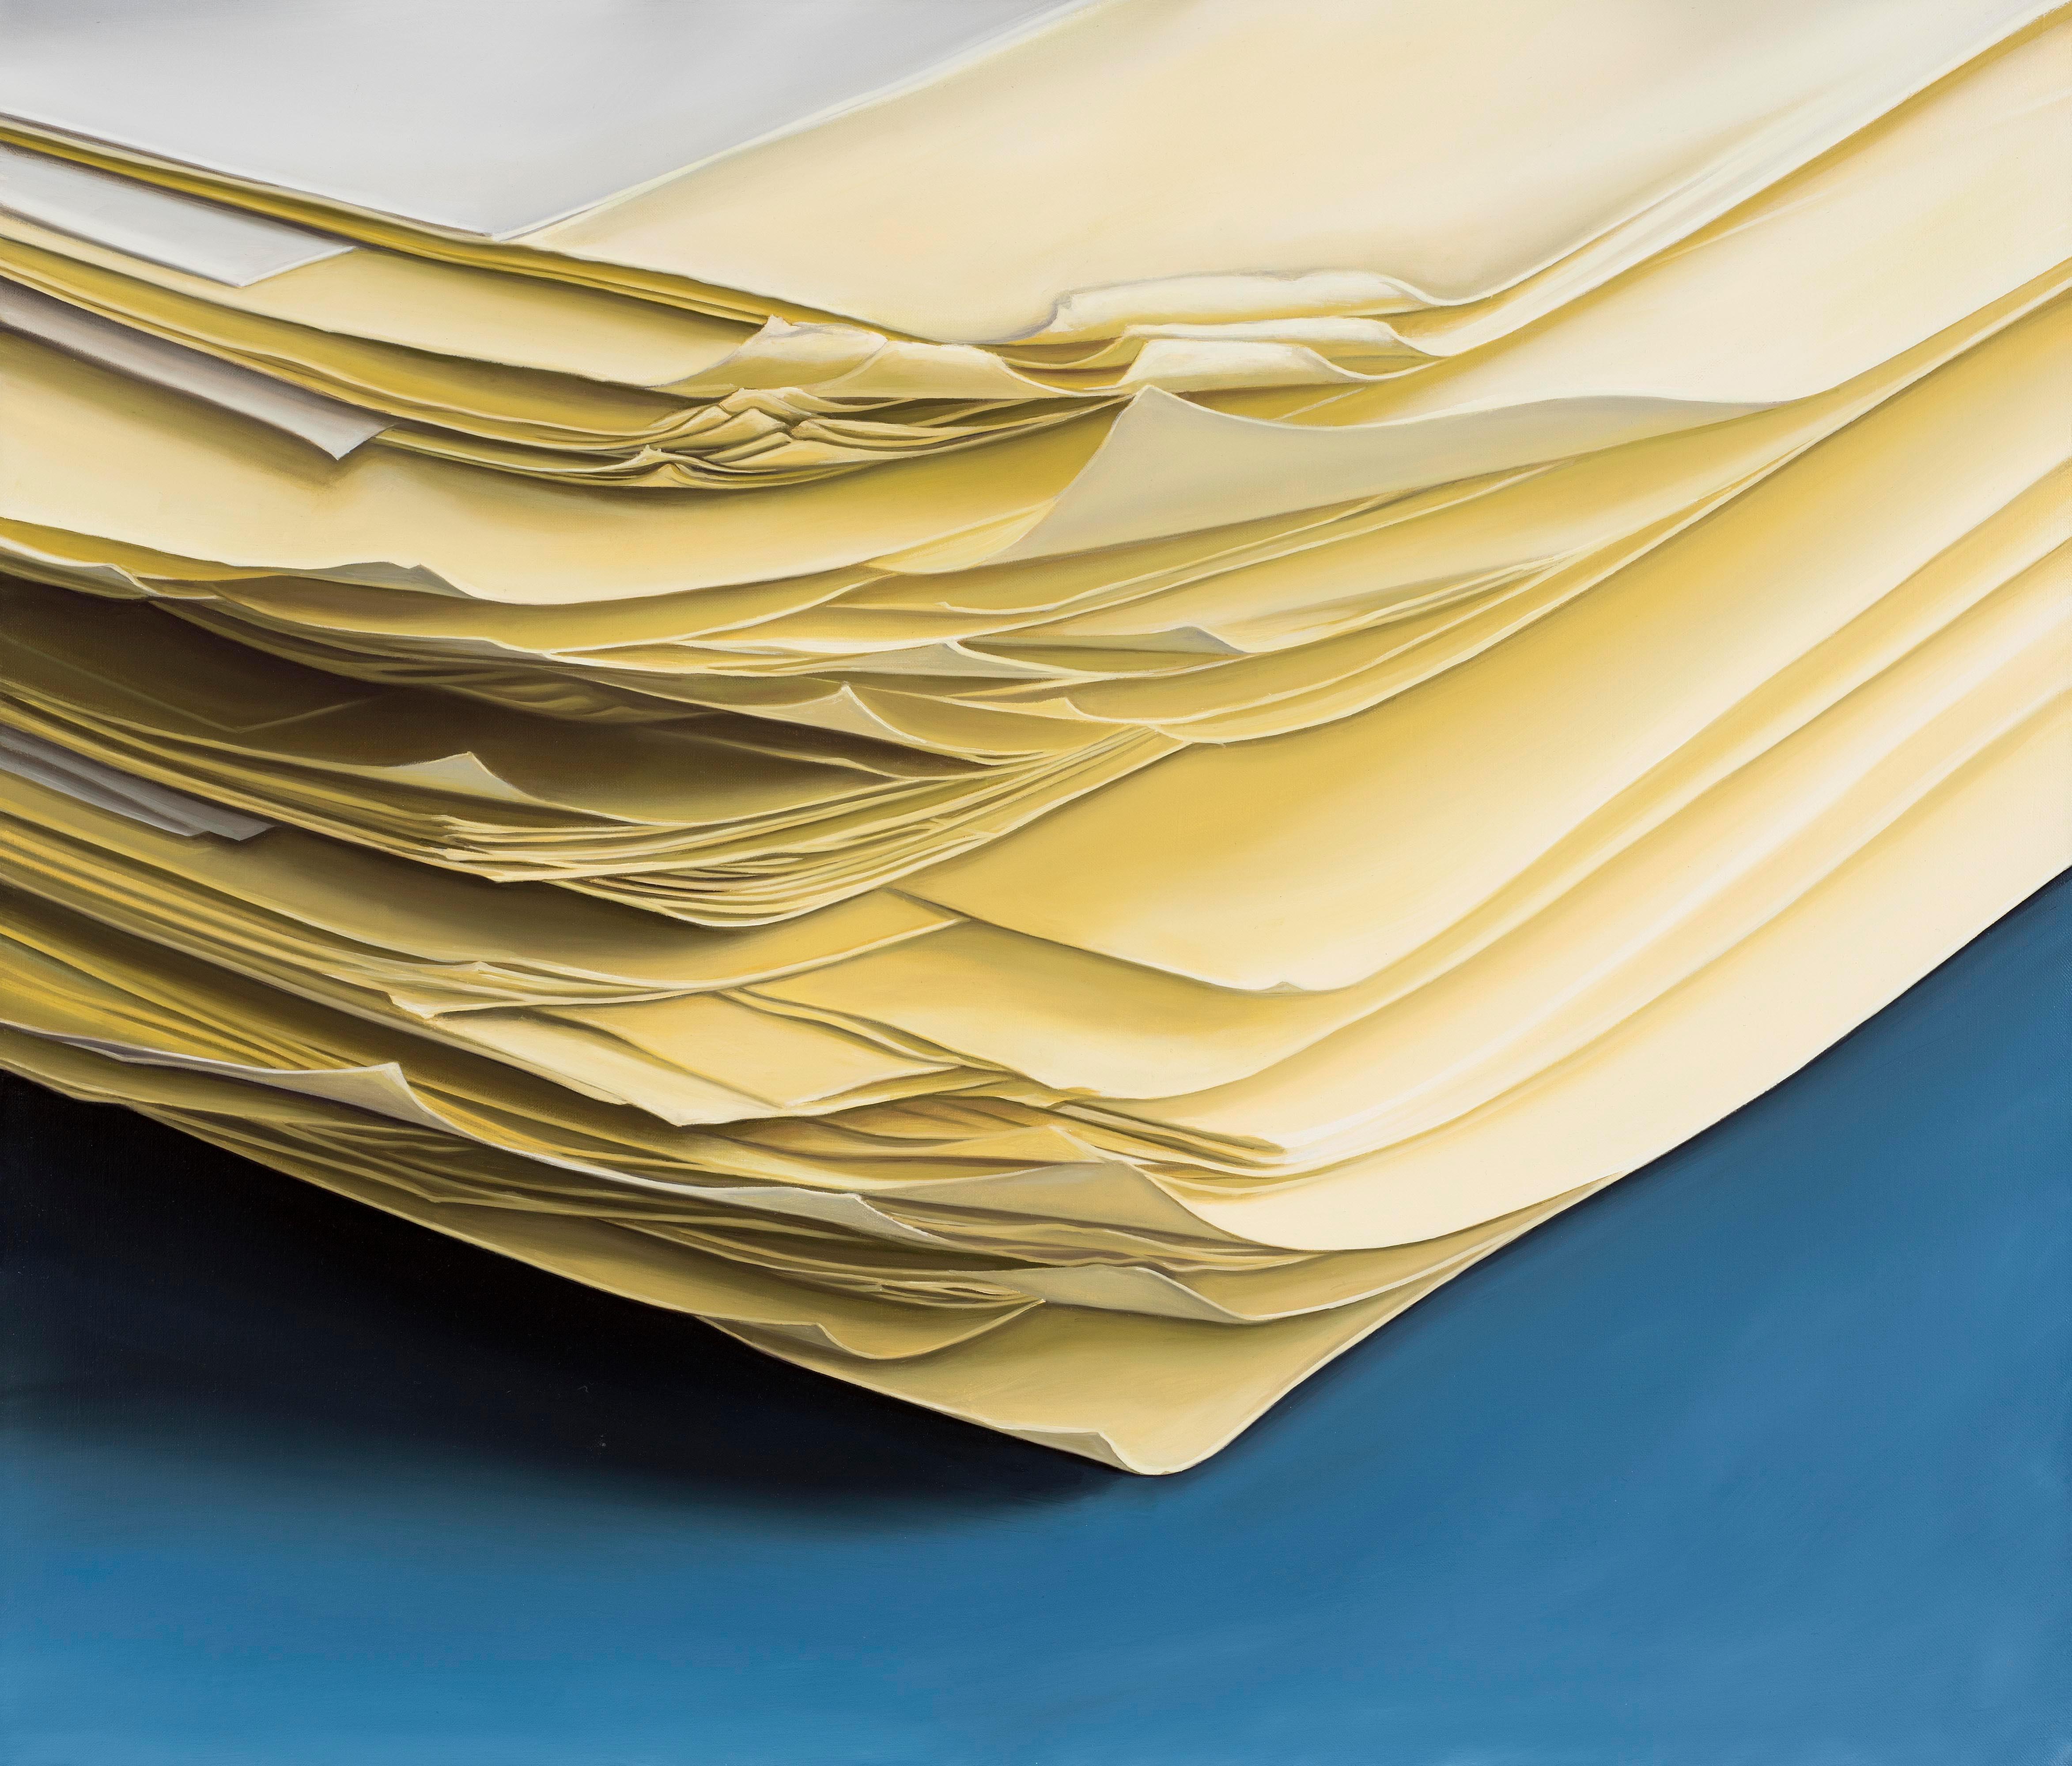 Roald Dahl's Manuscripts: Photorealistic Book Painting by Ian Robinson